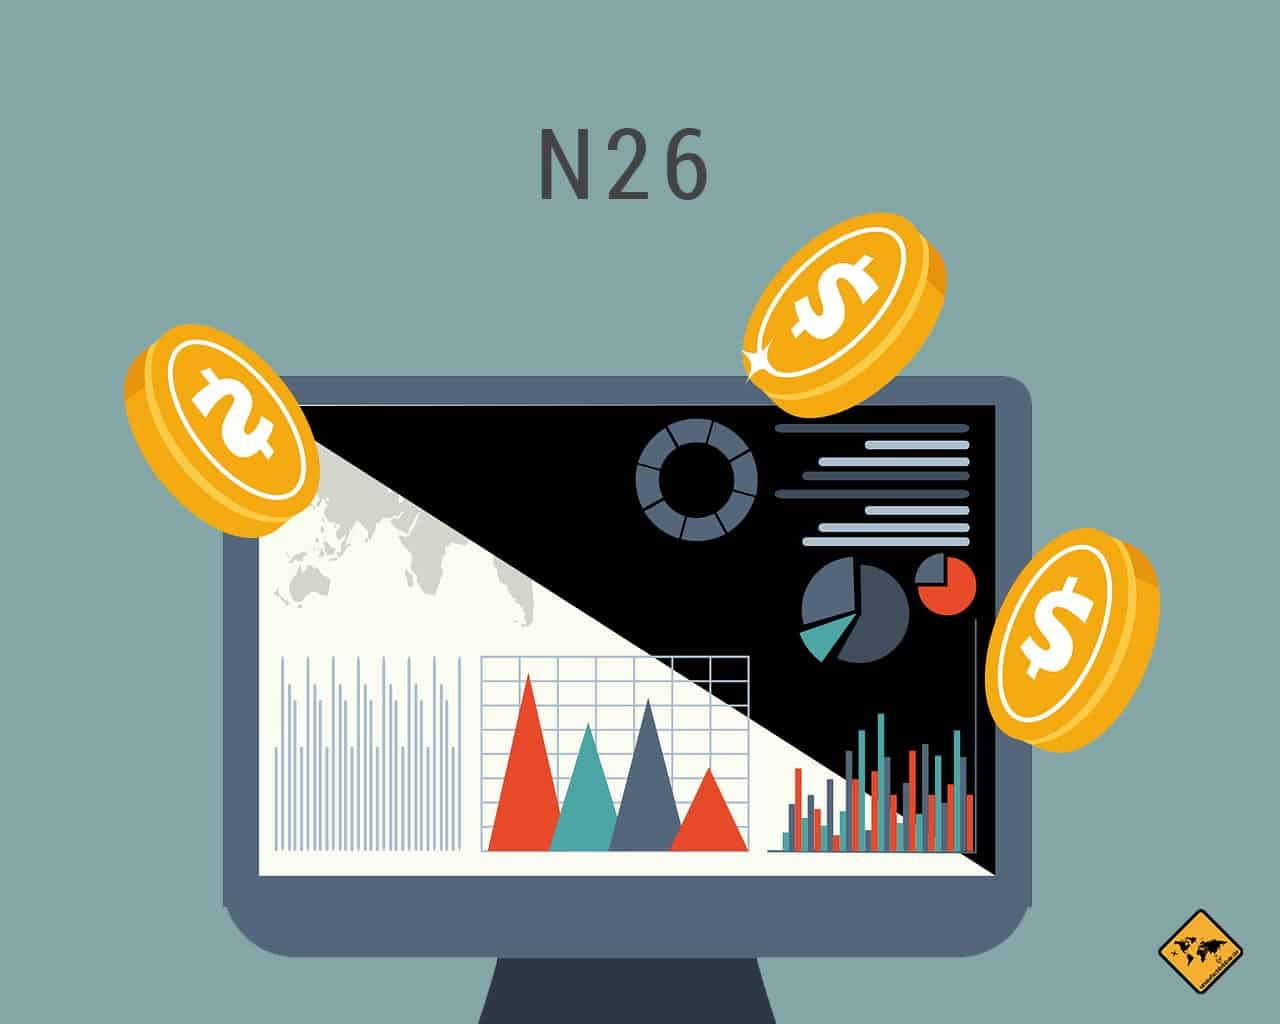 N26 Bankkonto Kreditkarte digitale Nomaden